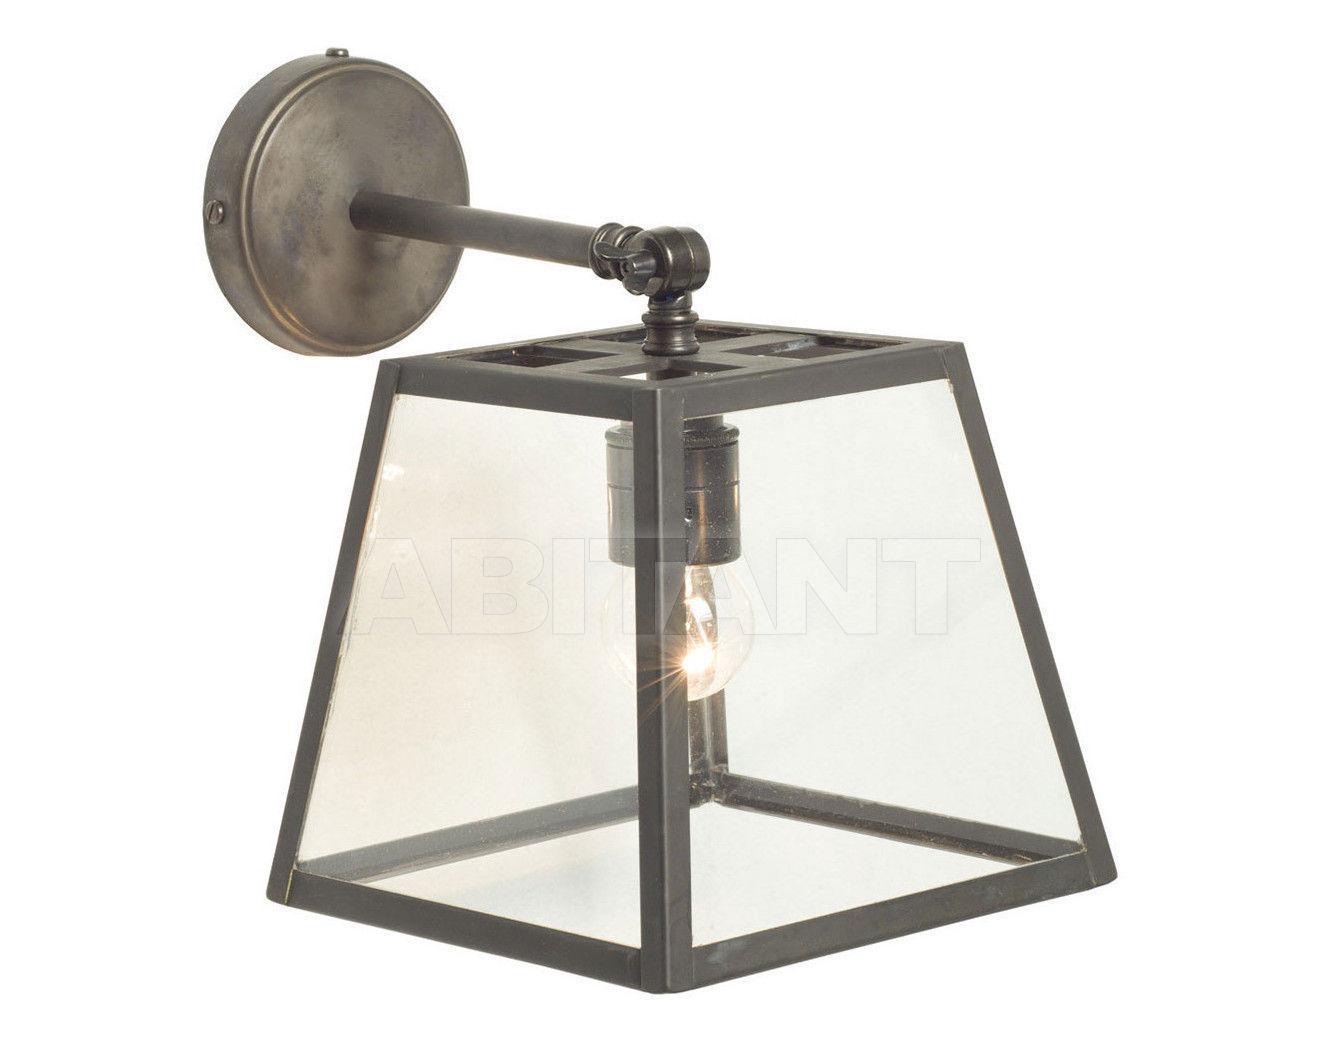 Купить Светильник Davey Lighting Wall Mounted Lights 7636/BR/WE/BRKT